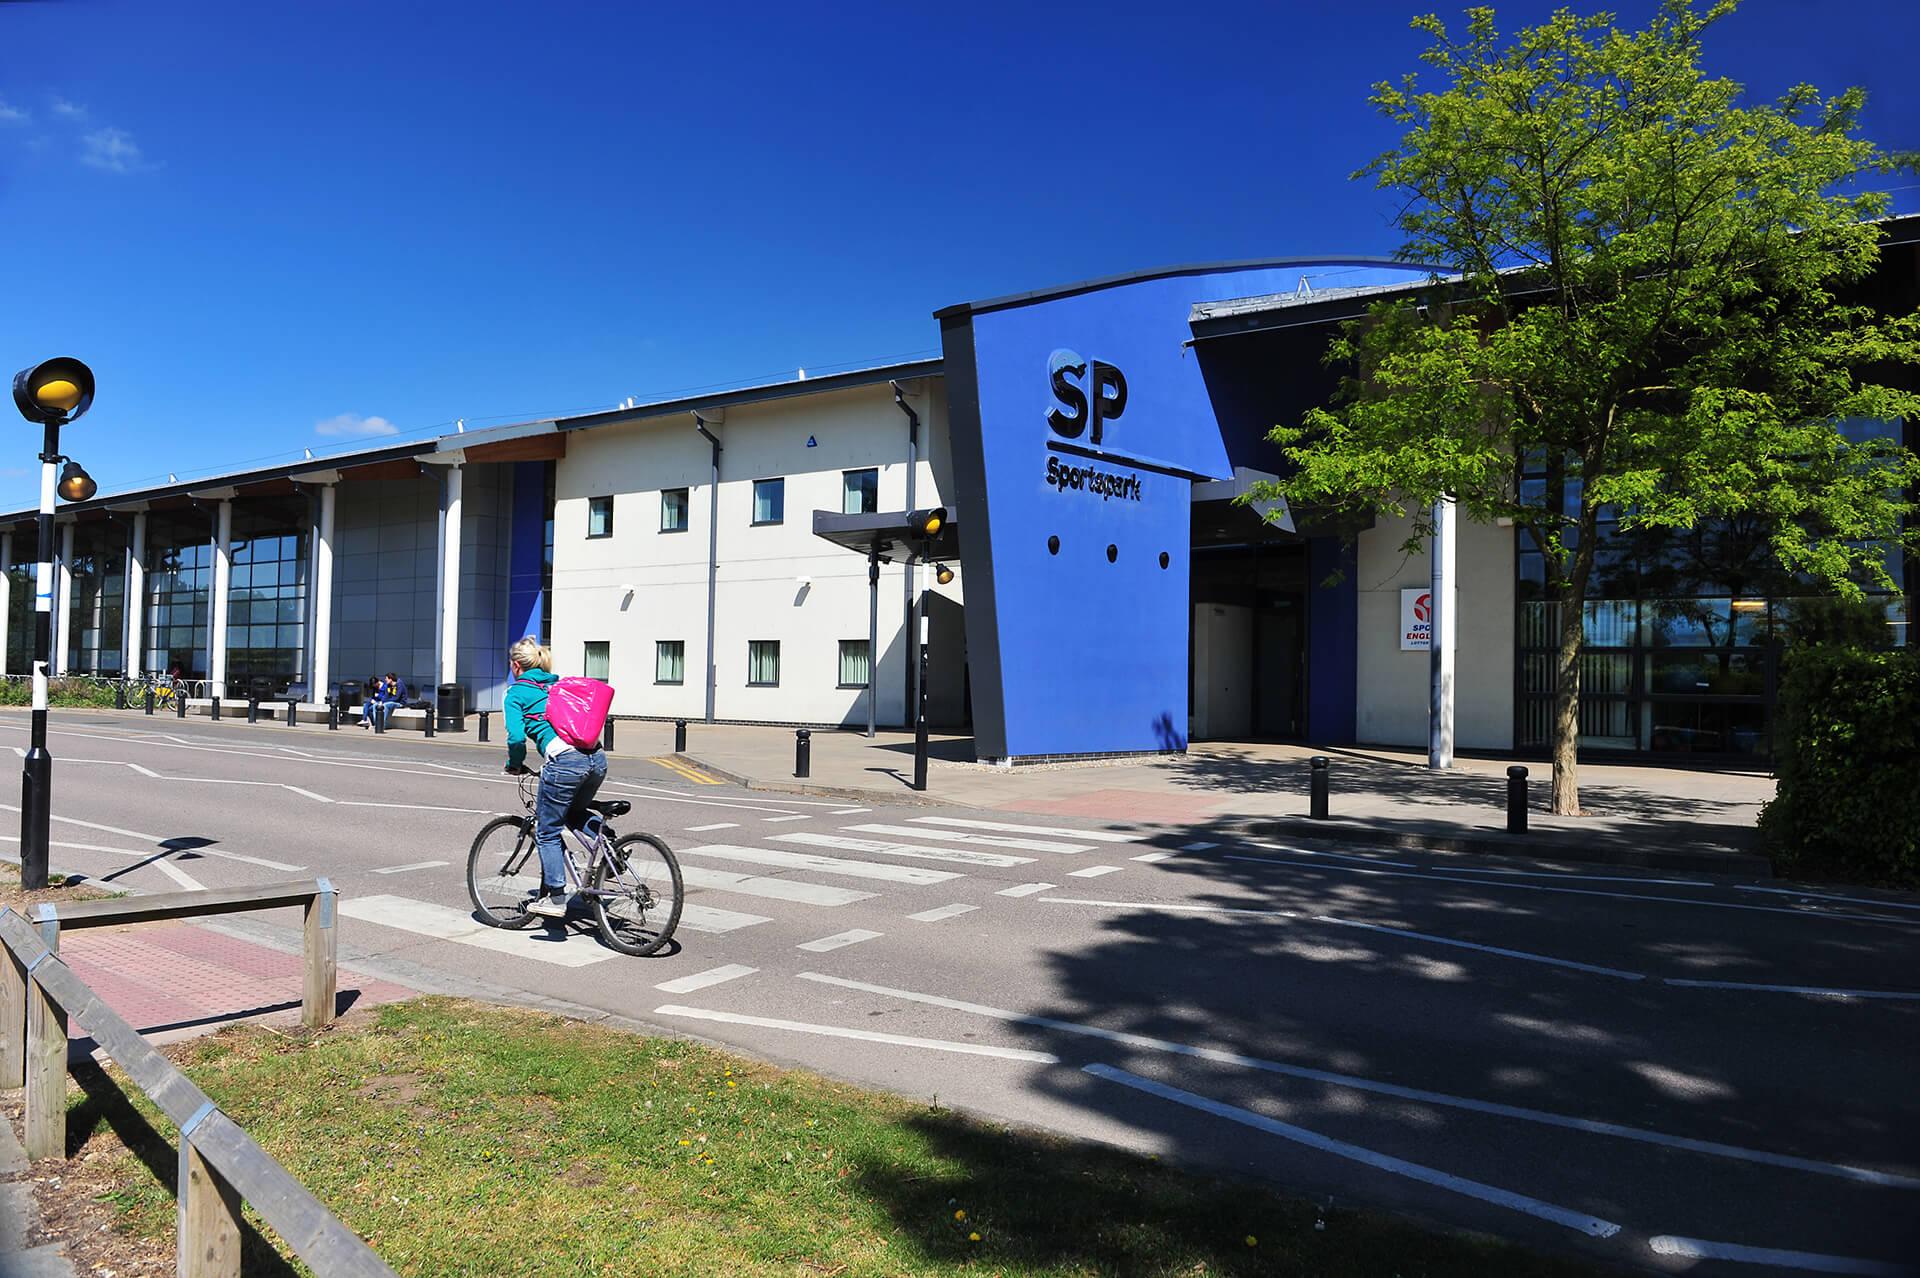 Outside view of UEA Sportspark